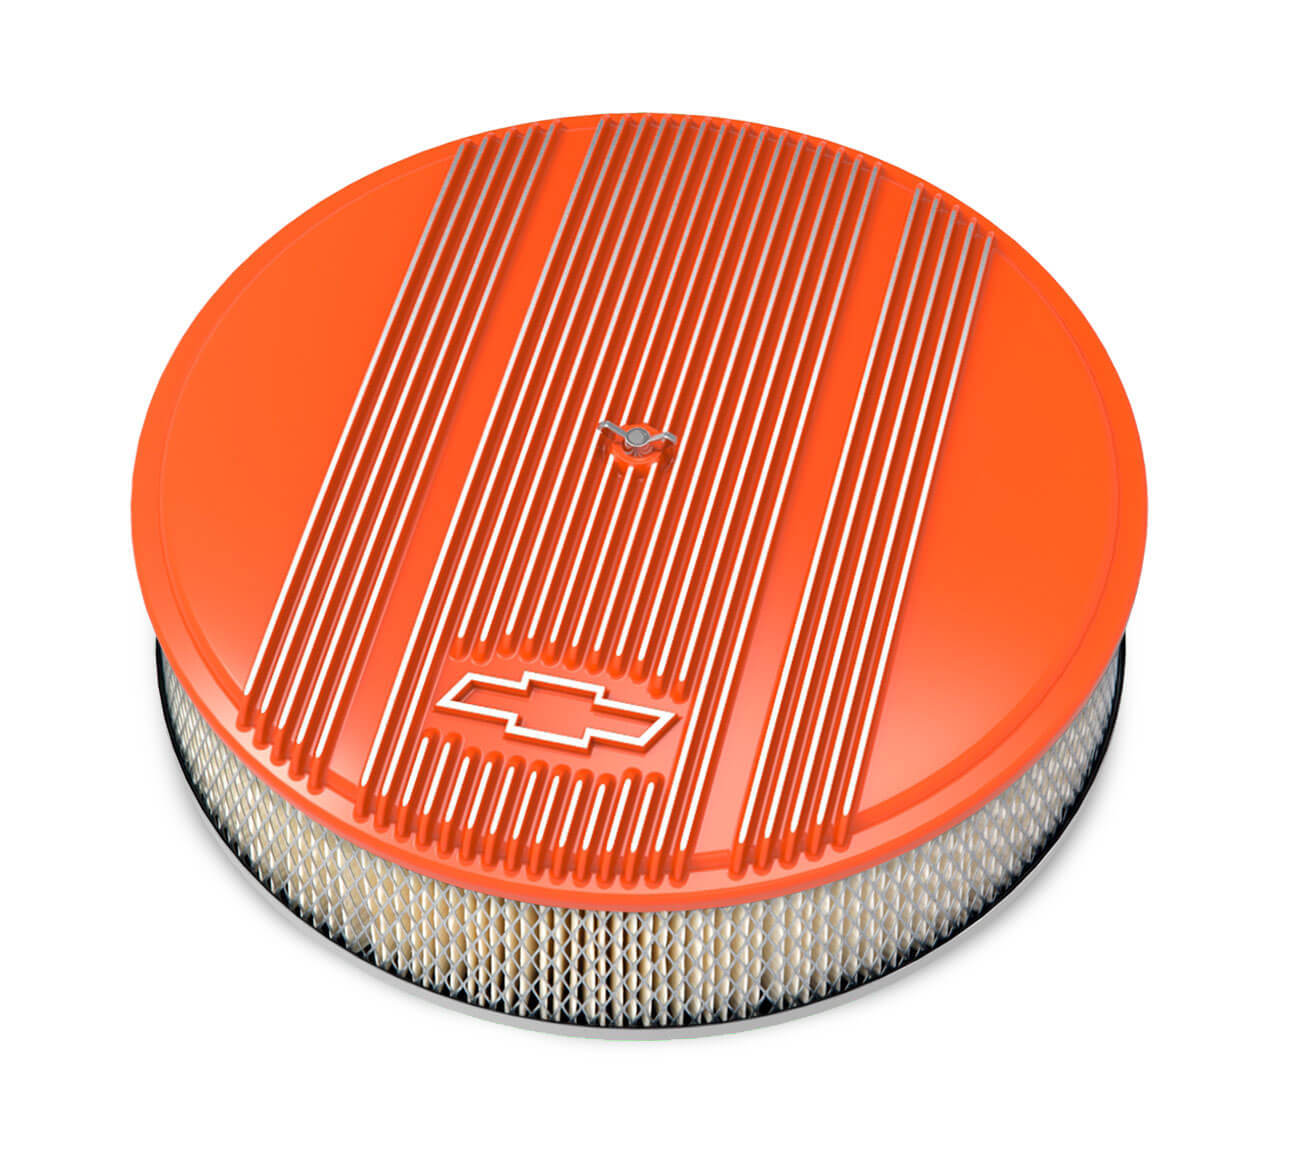 Holley 14 x 3 Air Cleaner Finned Bowtie Orange